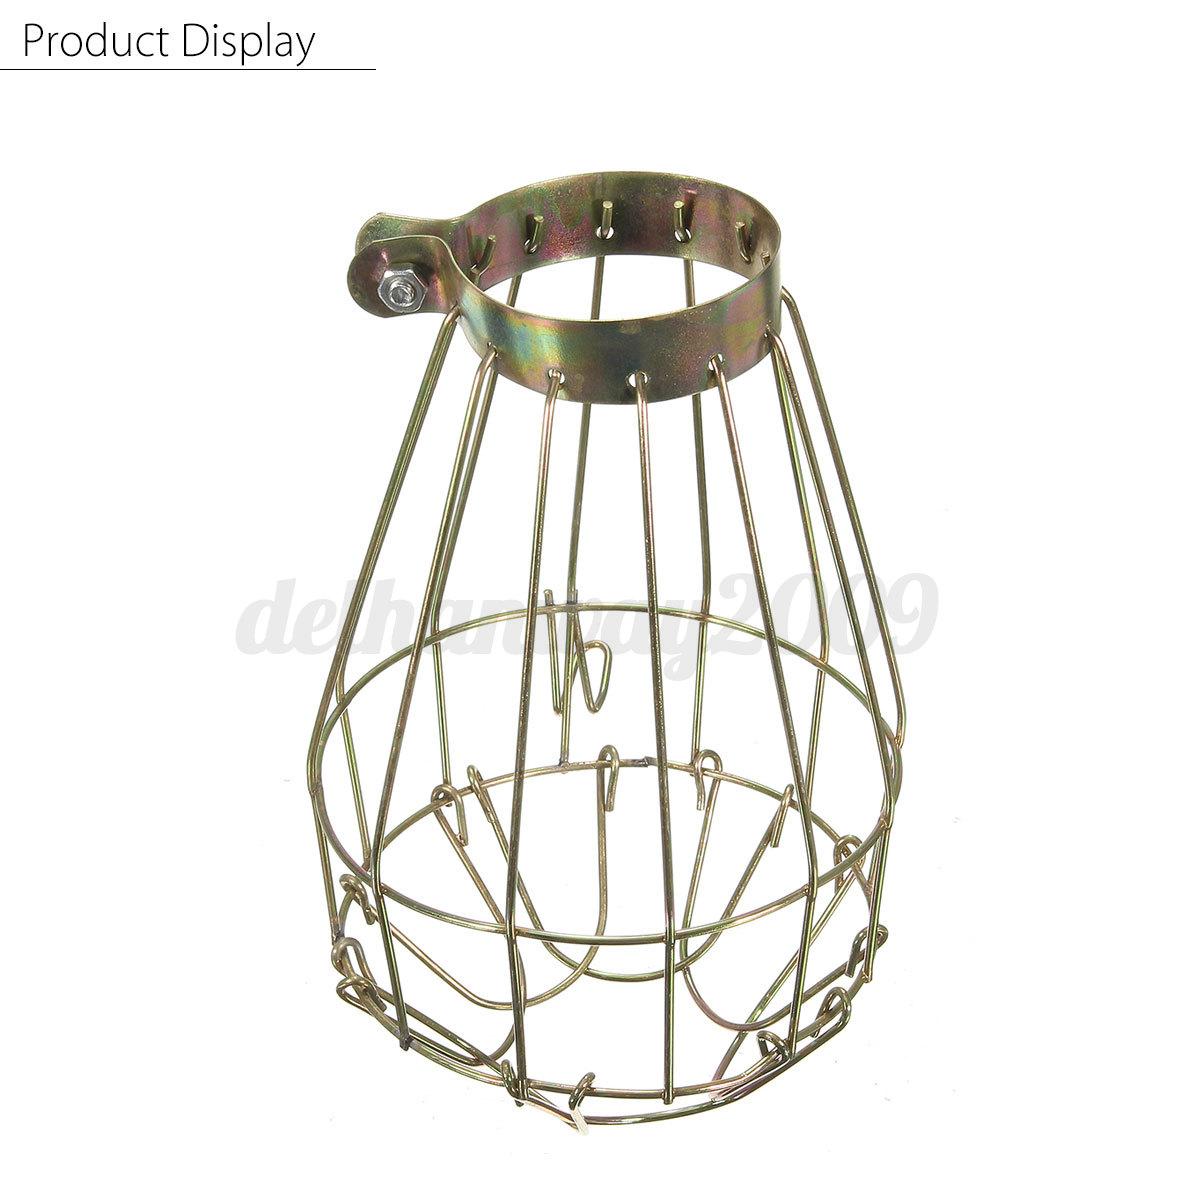 heat shade cover reptile vivarium basking lamp bulb safety. Black Bedroom Furniture Sets. Home Design Ideas